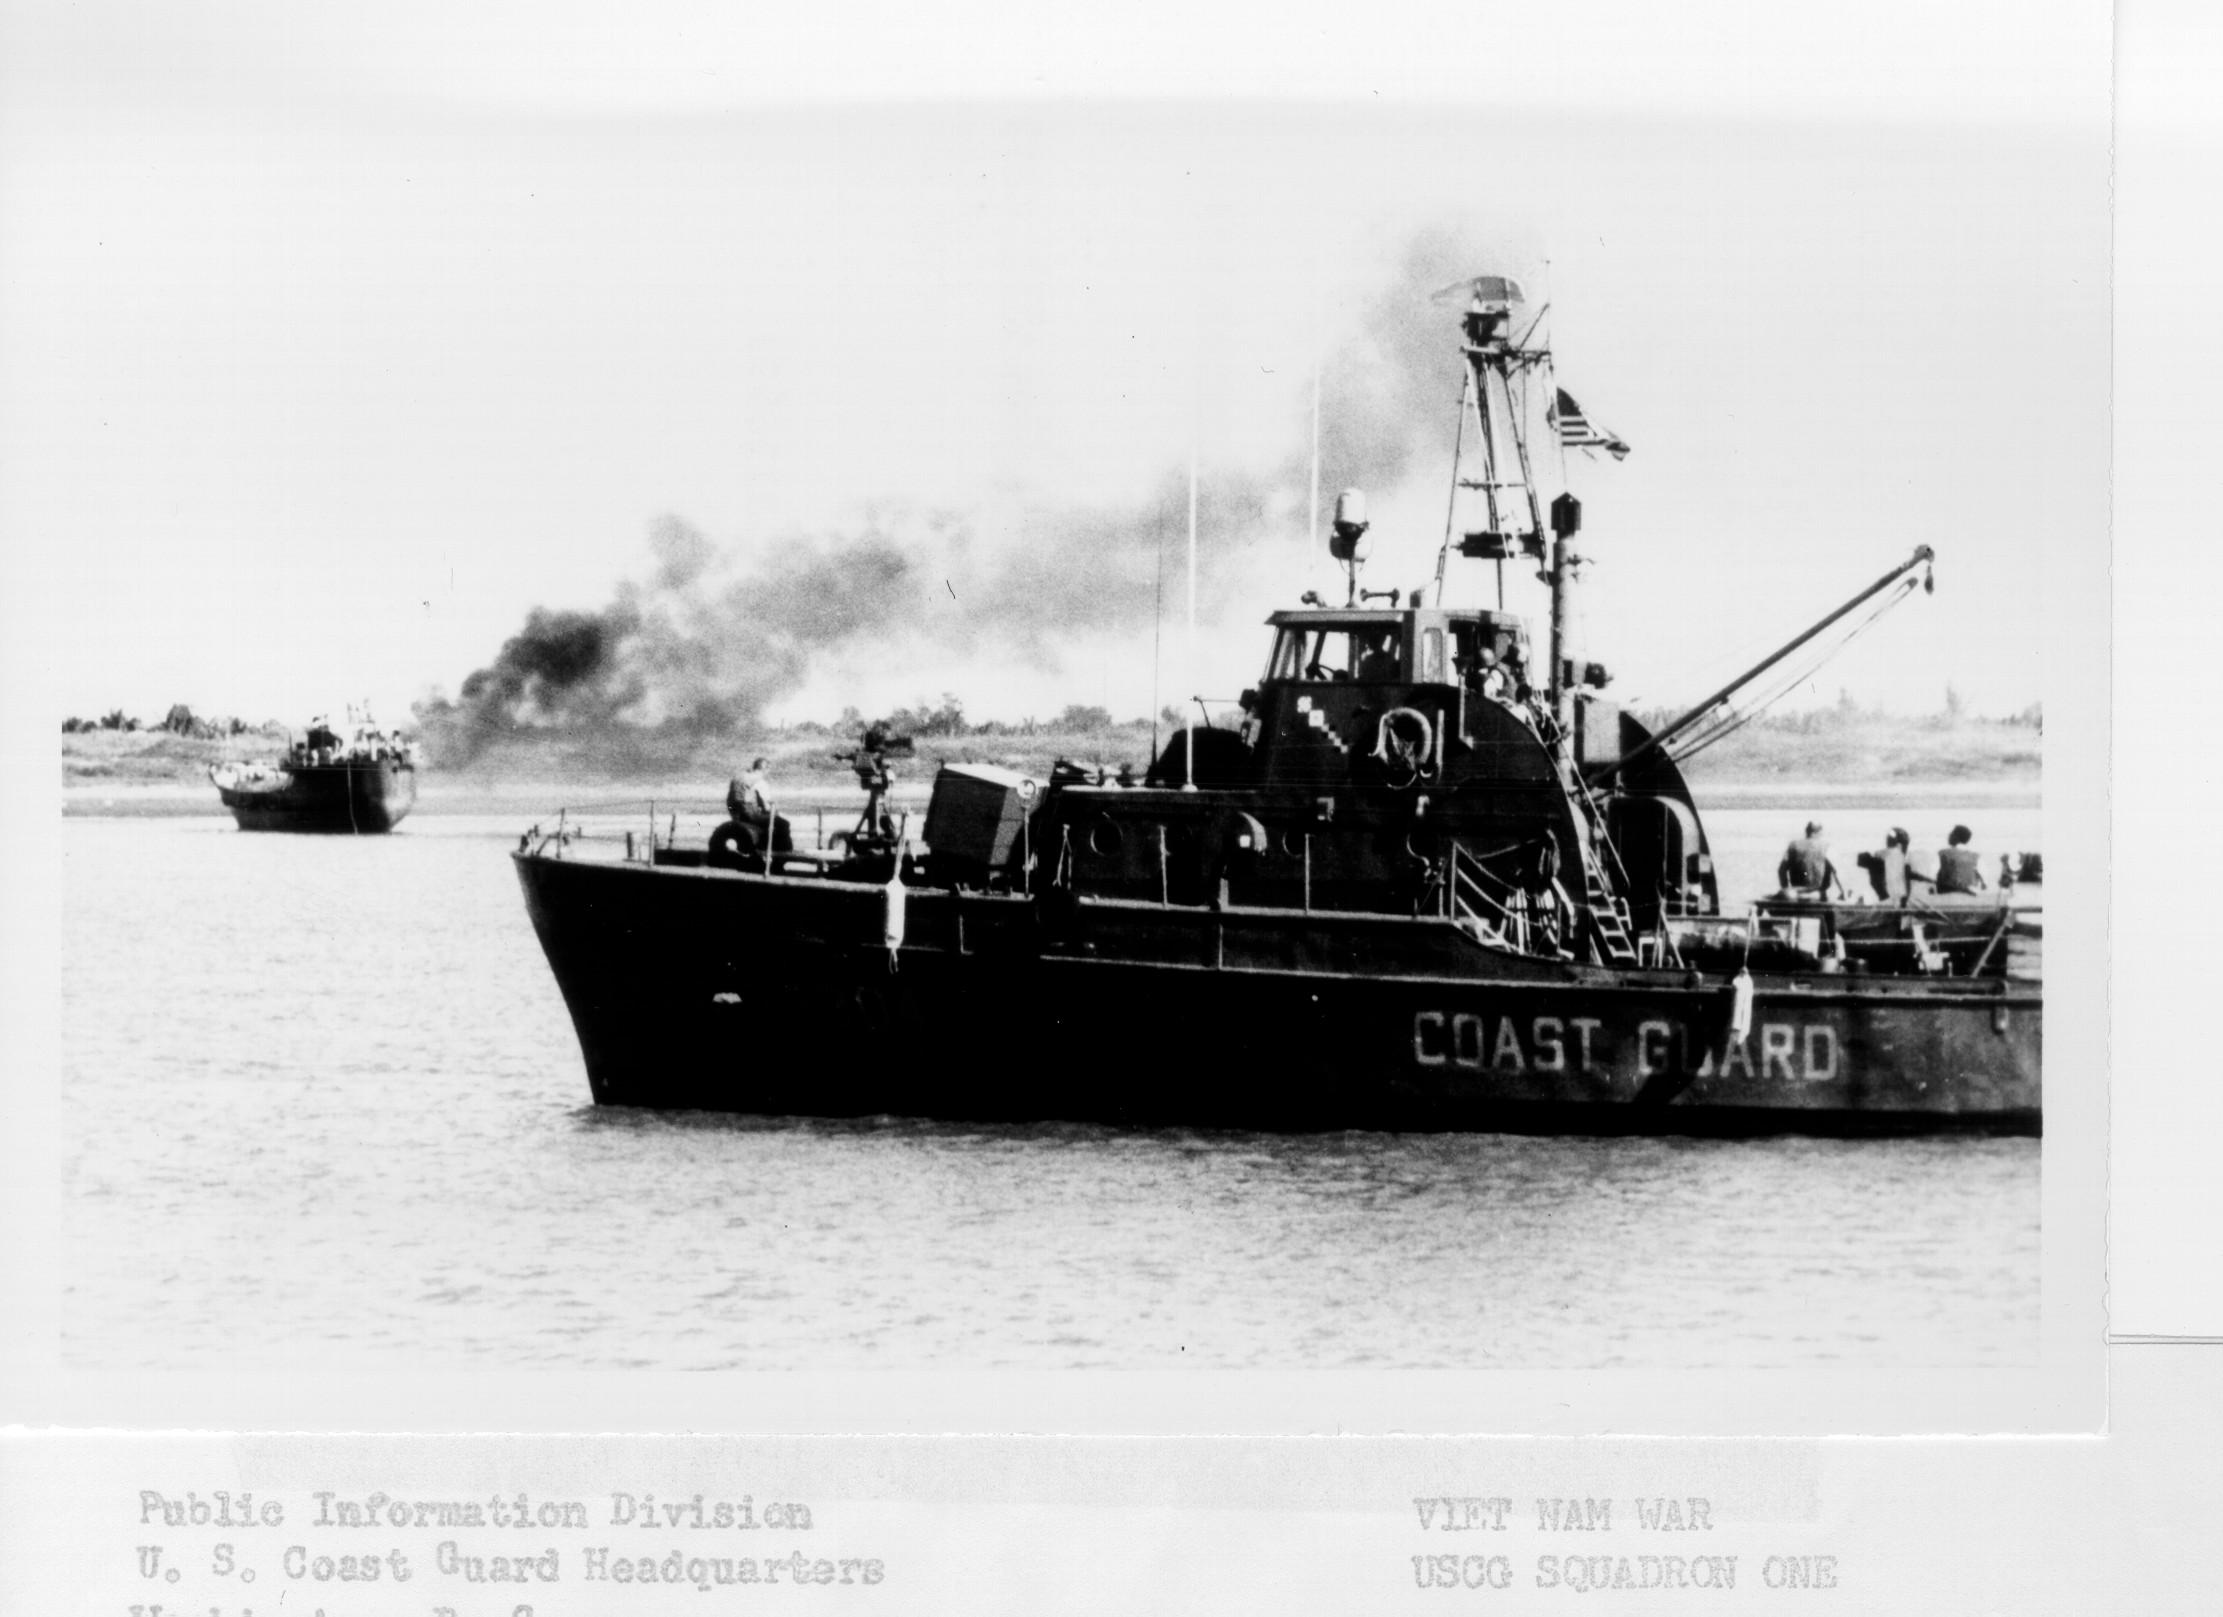 https://i0.wp.com/upload.wikimedia.org/wikipedia/commons/2/22/VTN_Burning_Trawler_sm.jpg